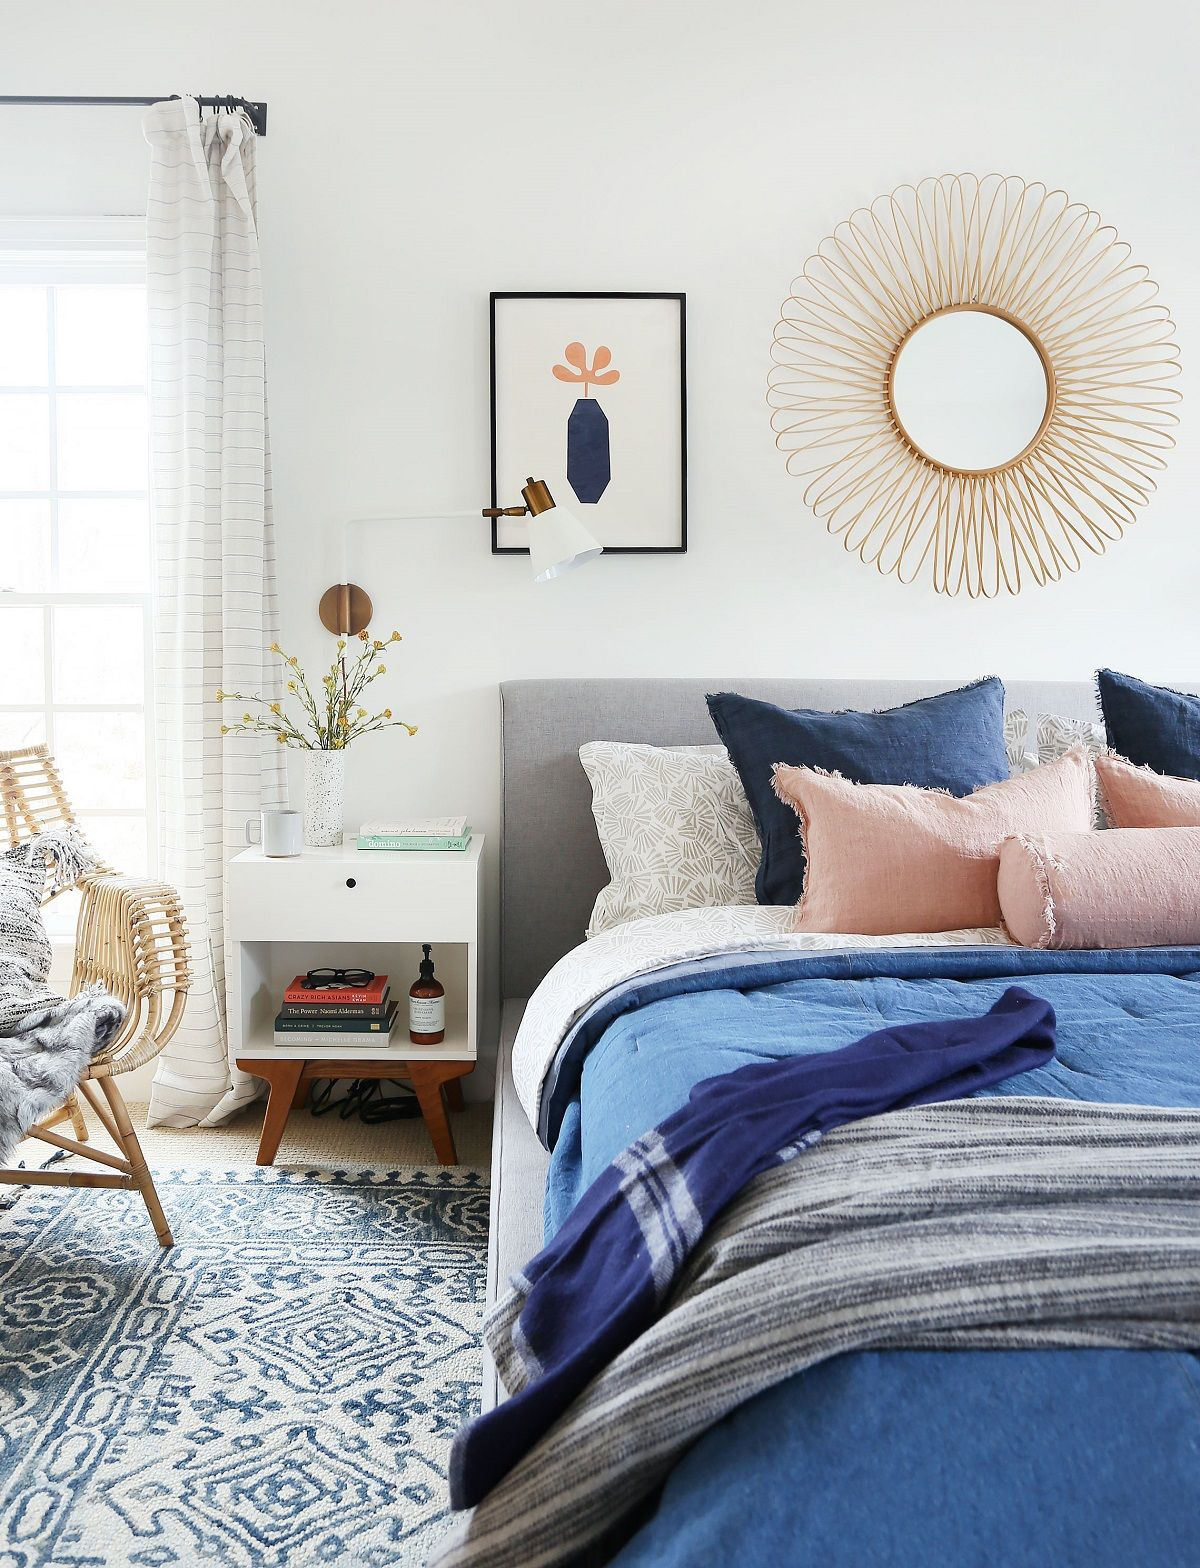 Modern Meets Traditional 10 Bedroom Decor Tips Bedroom Decor